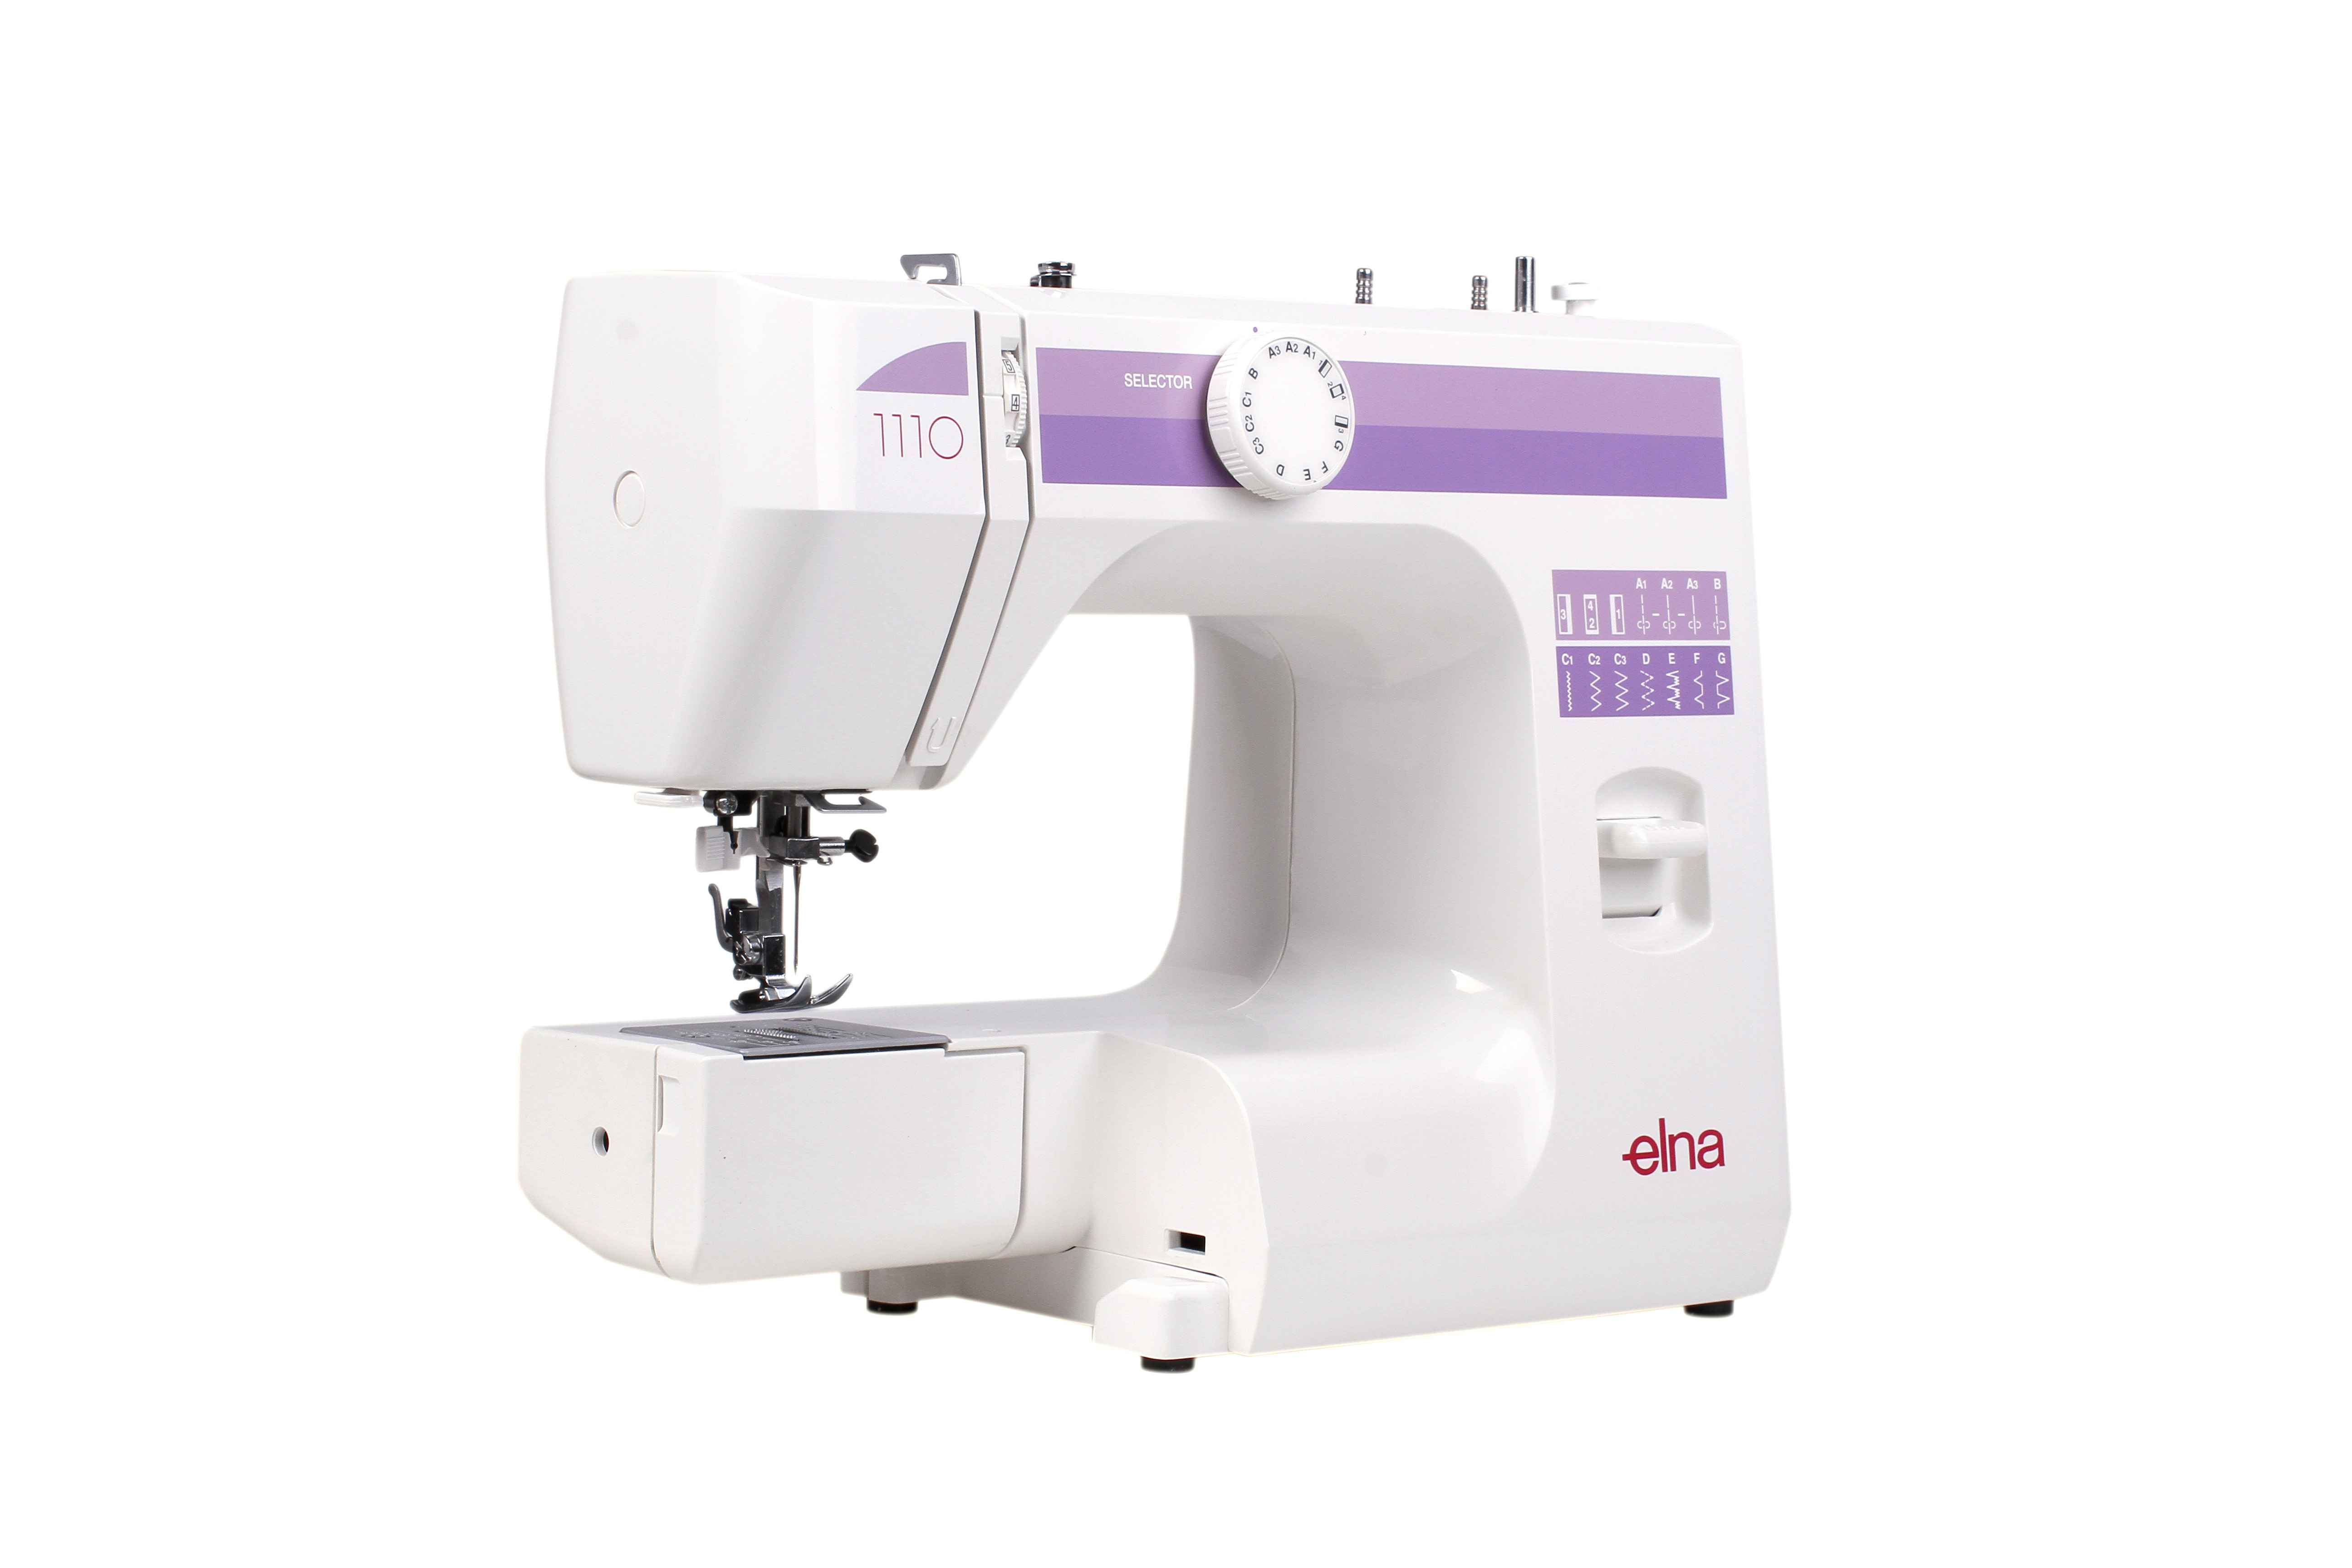 цена на Швейная машинка Elna 1110